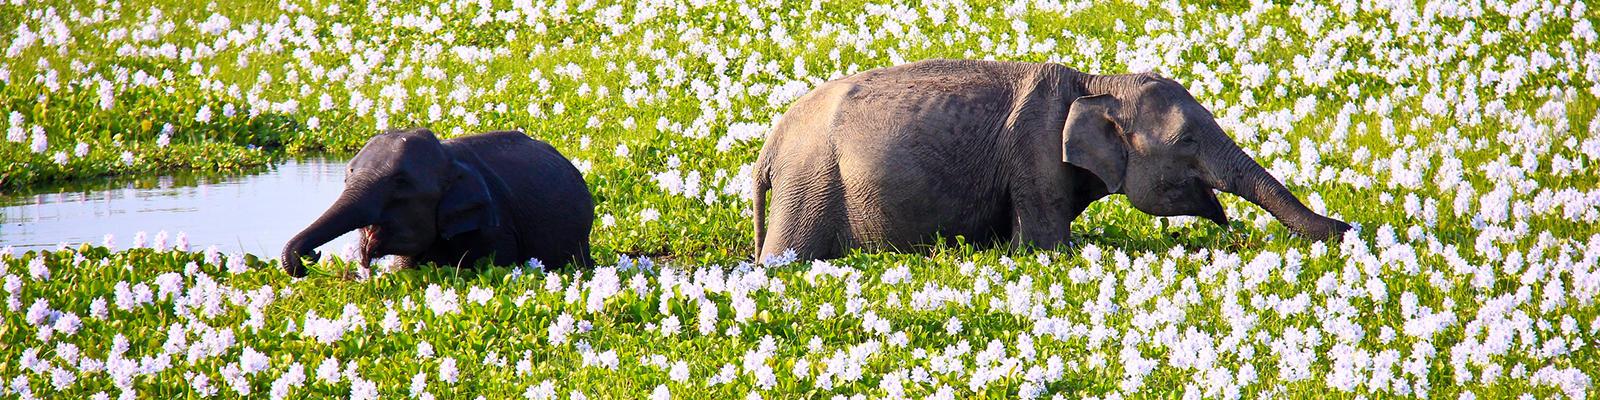 elephants on safari in sri lanka